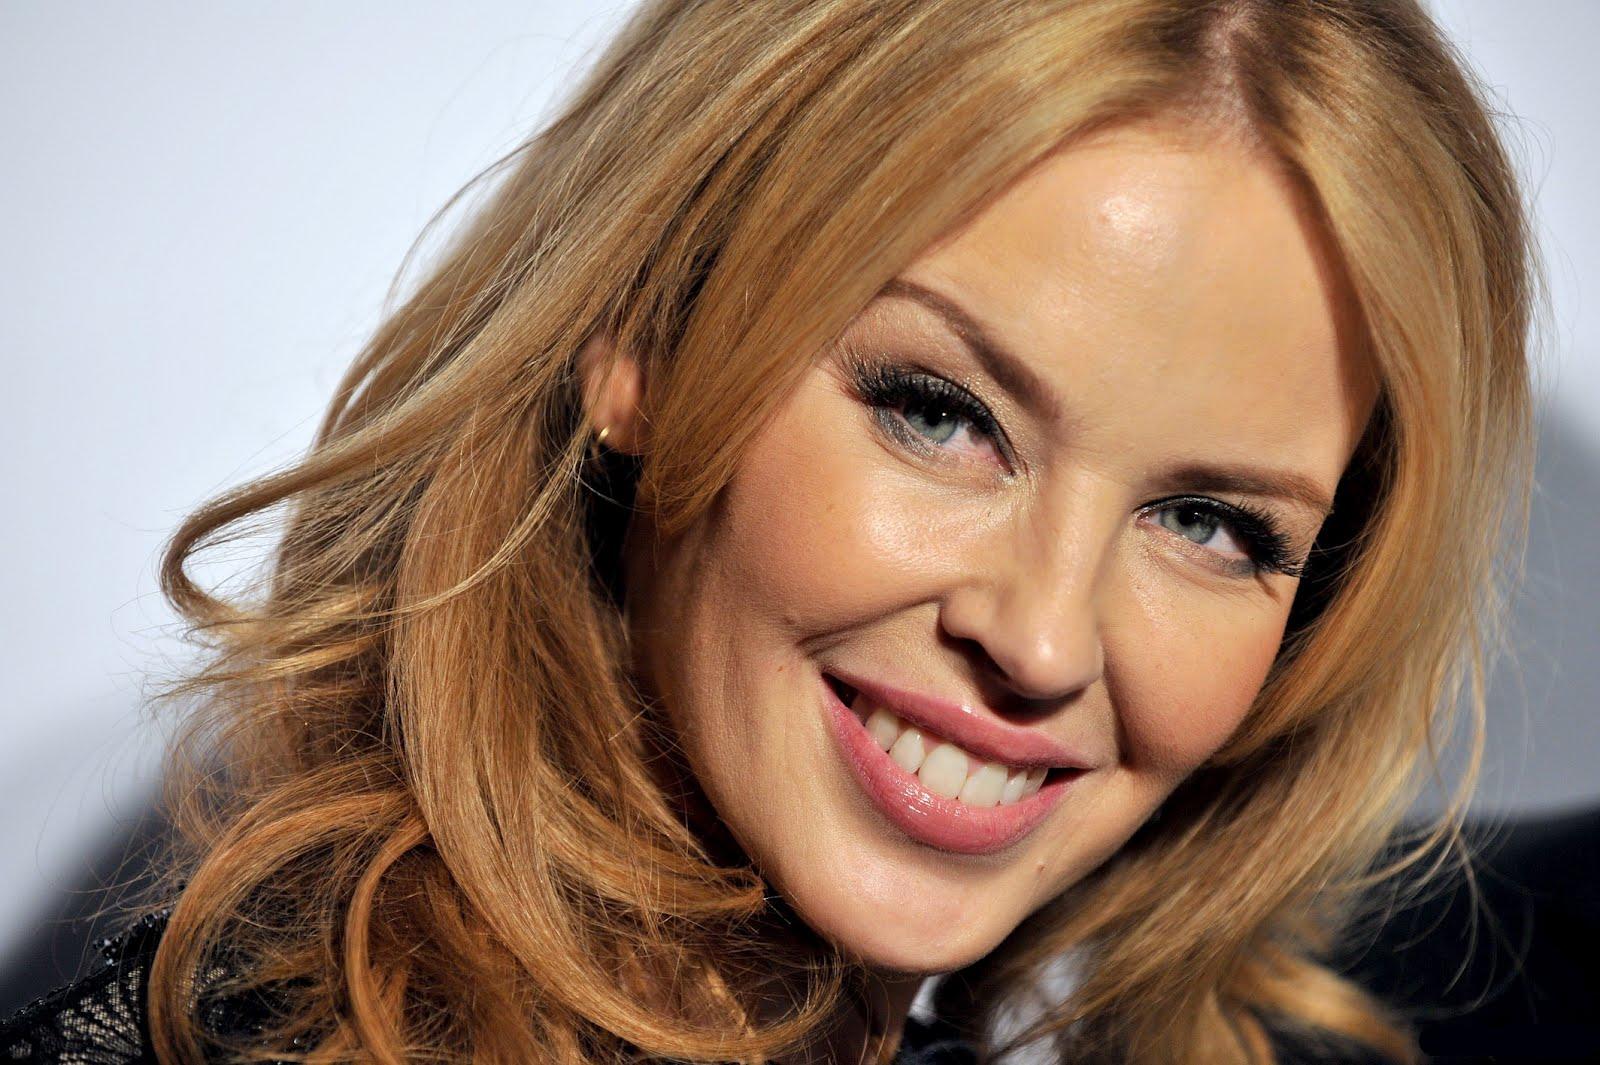 Londra-Kylie-Minogue-a-Oxford-Street-illumina-il-Natale-con-445-palline-d-oro